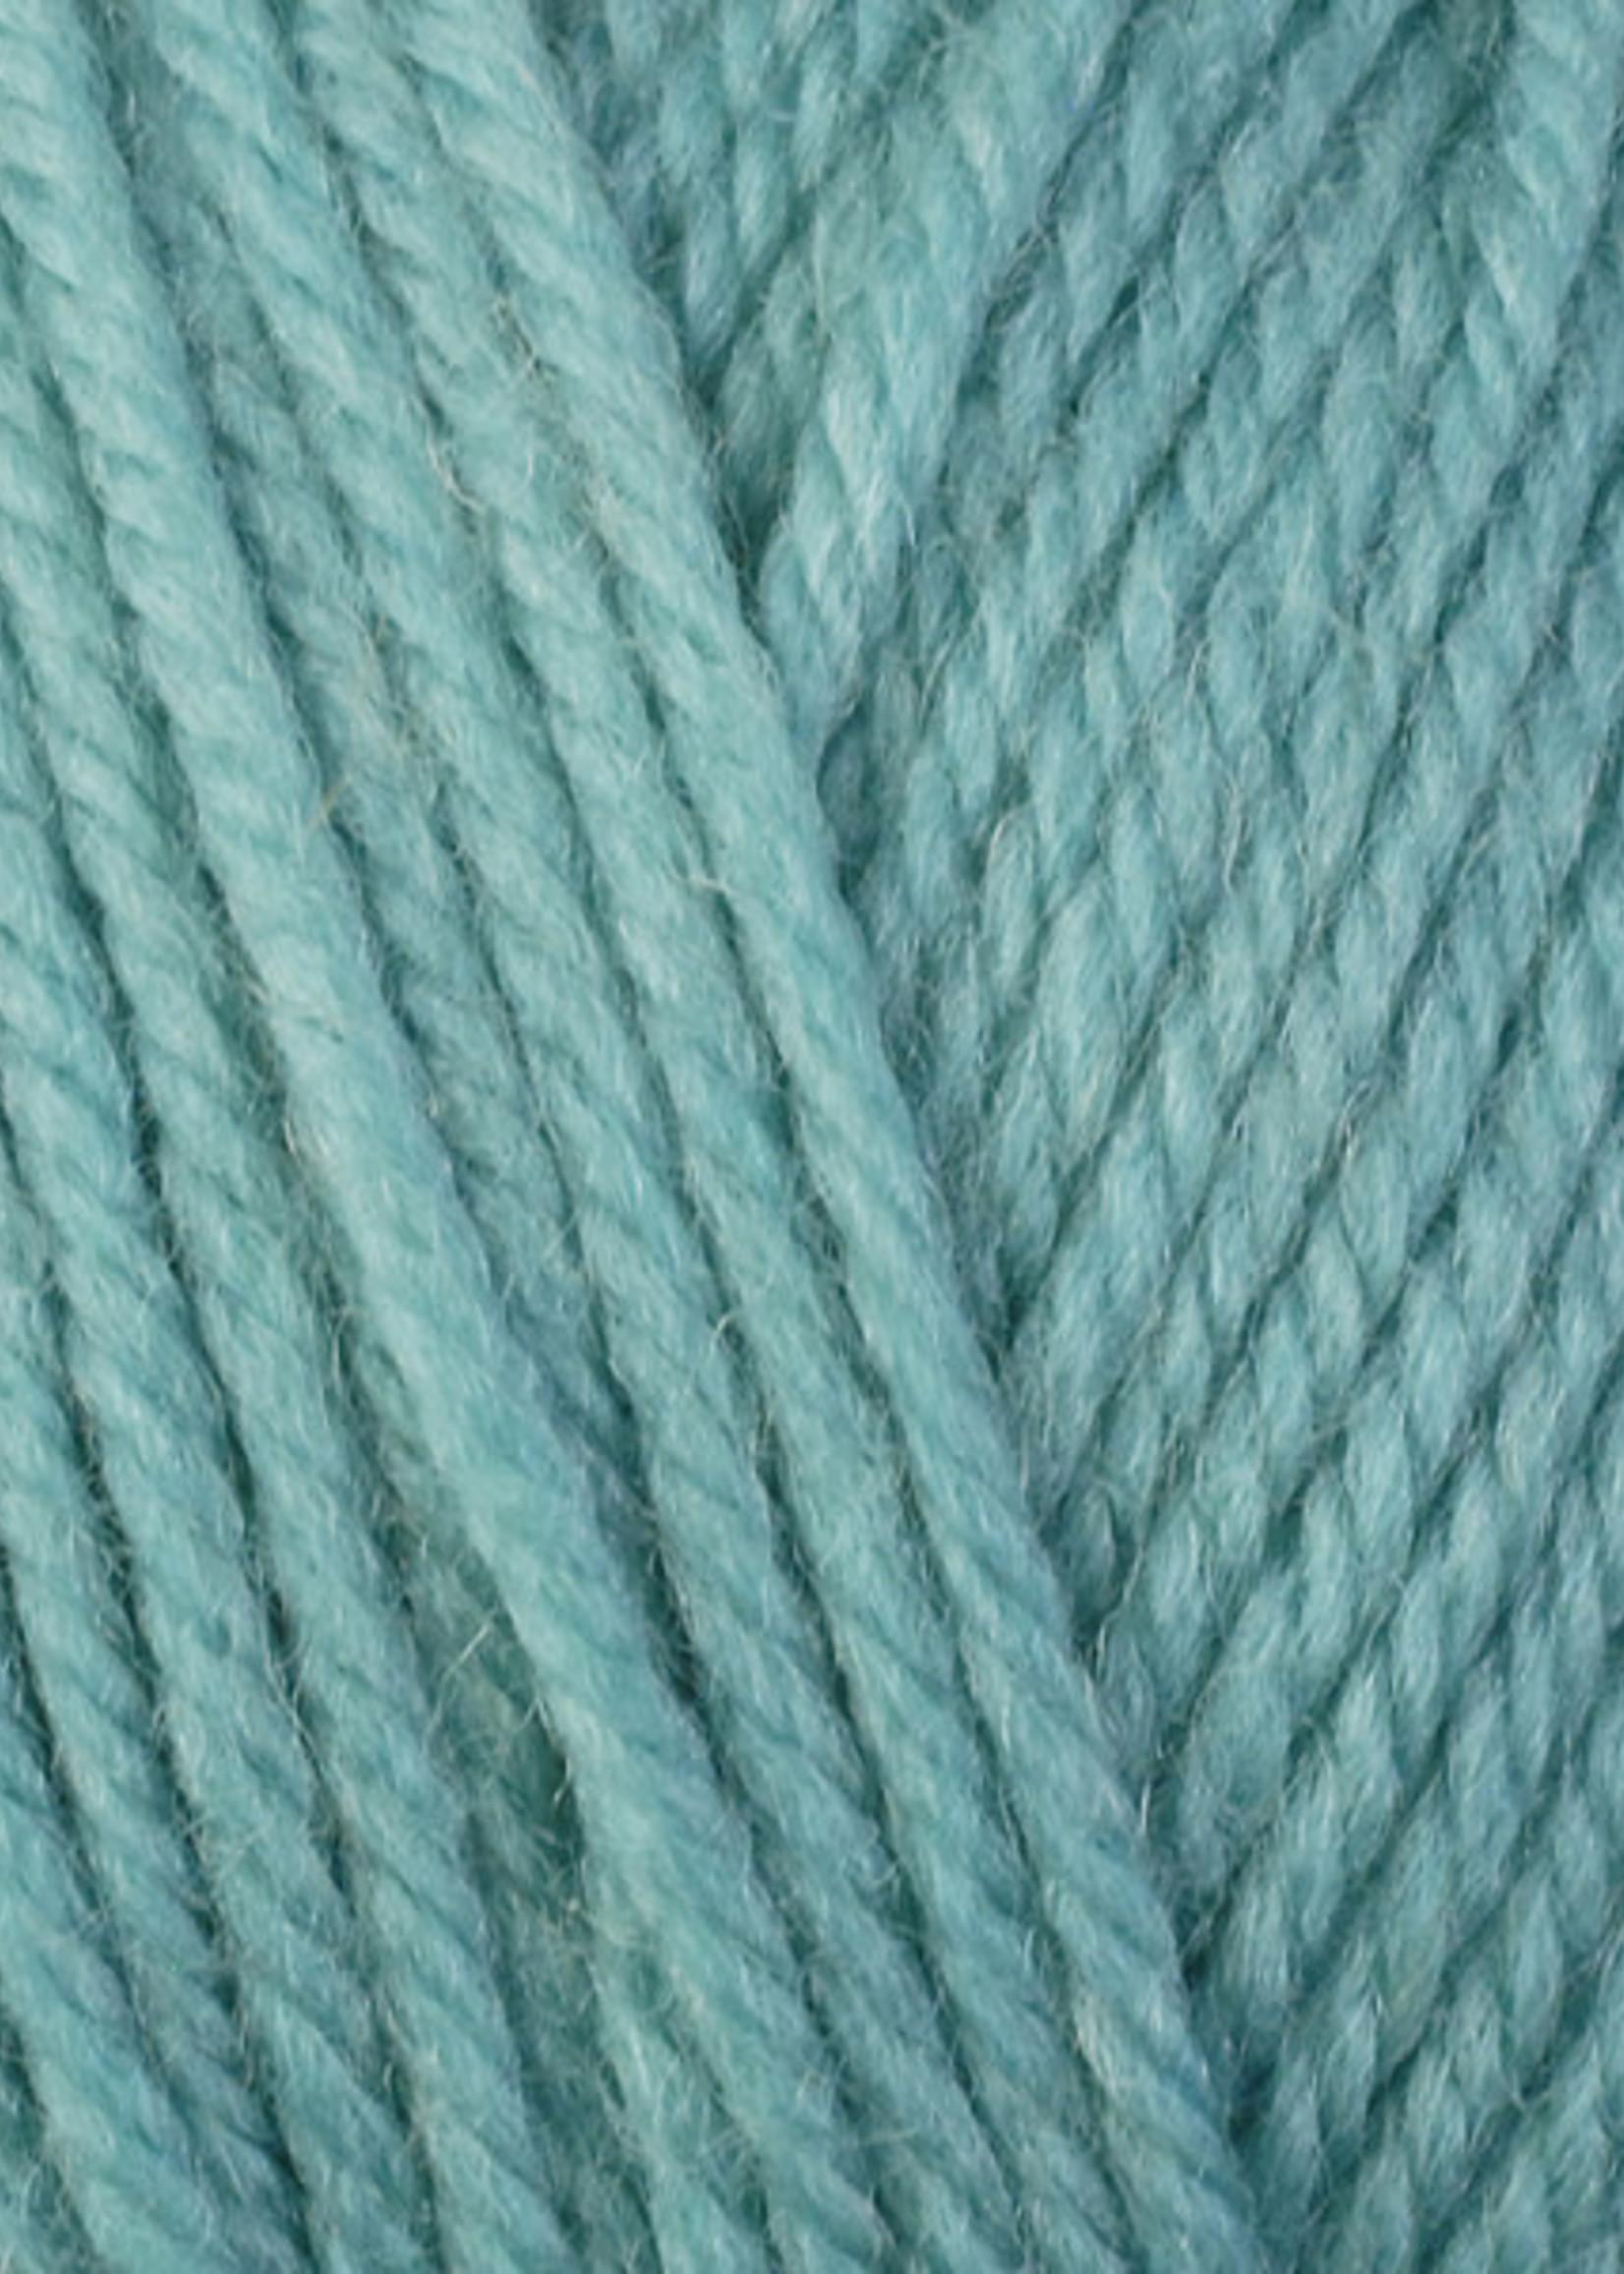 Berroco Berroco Ultra Wool 3346 Aqua